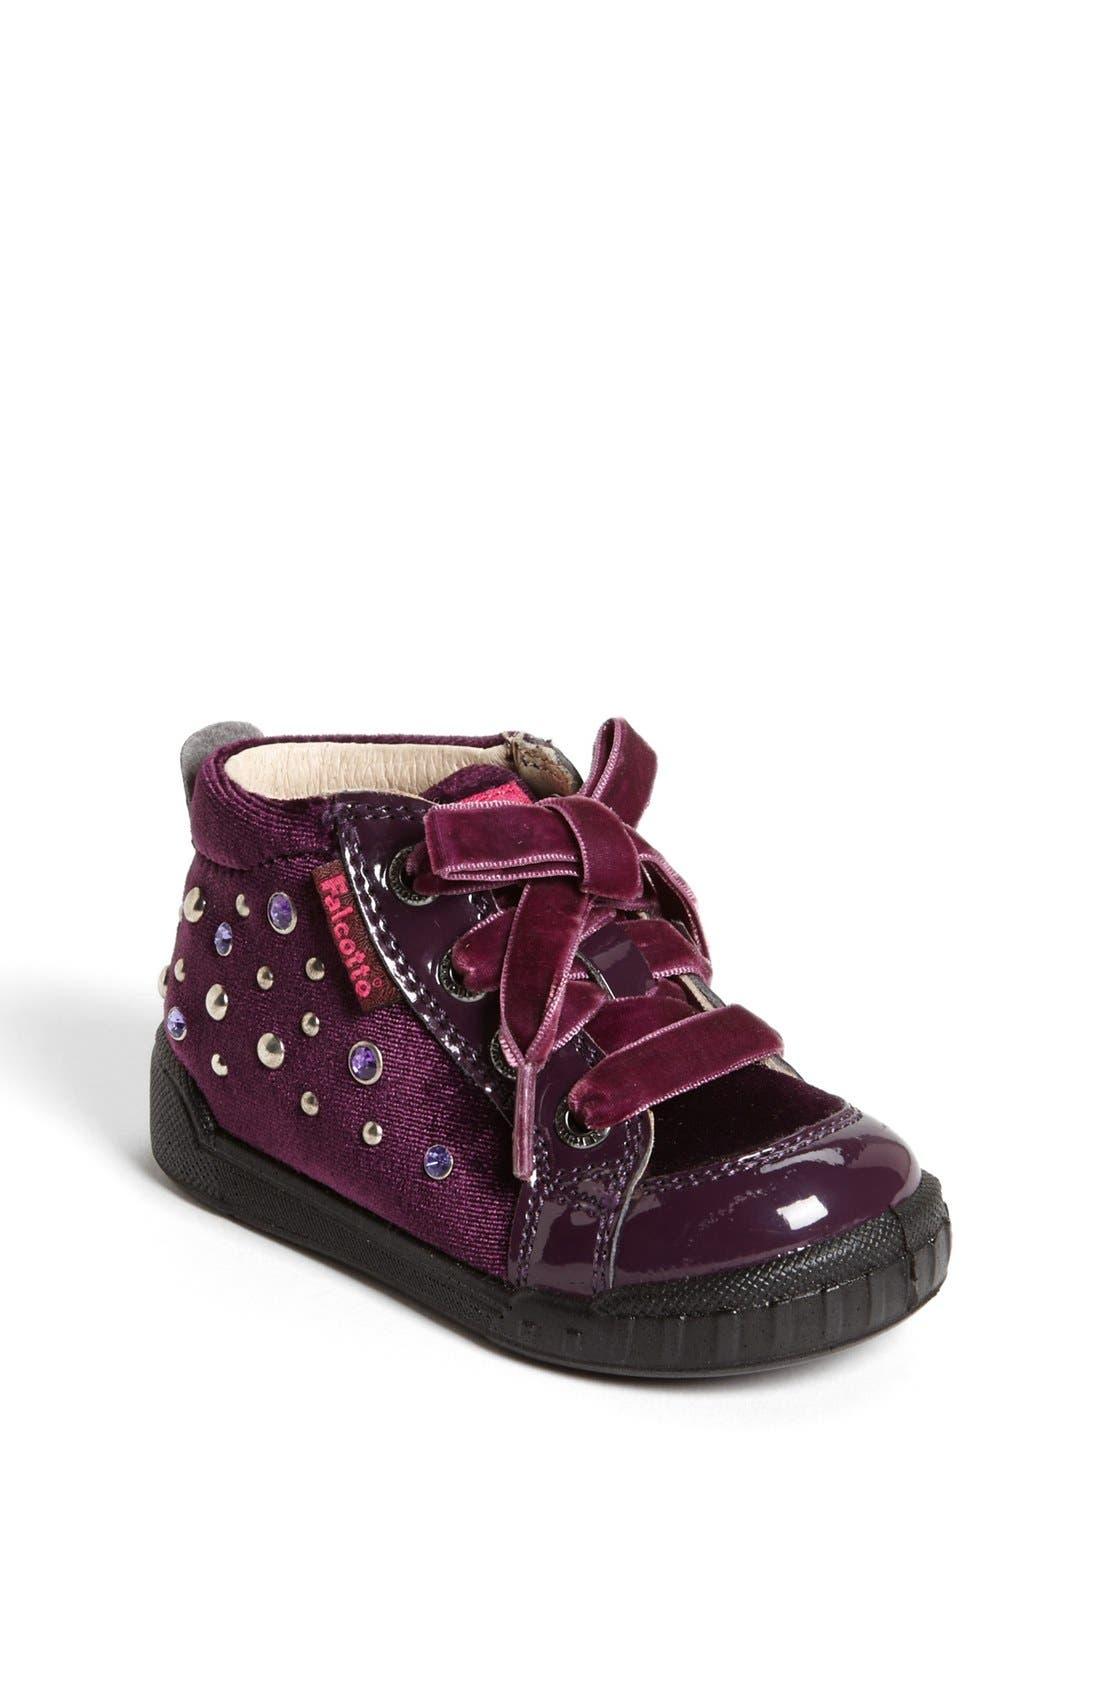 Alternate Image 1 Selected - Naturino 'Falcotto - 1203' Sneaker (Baby & Walker)